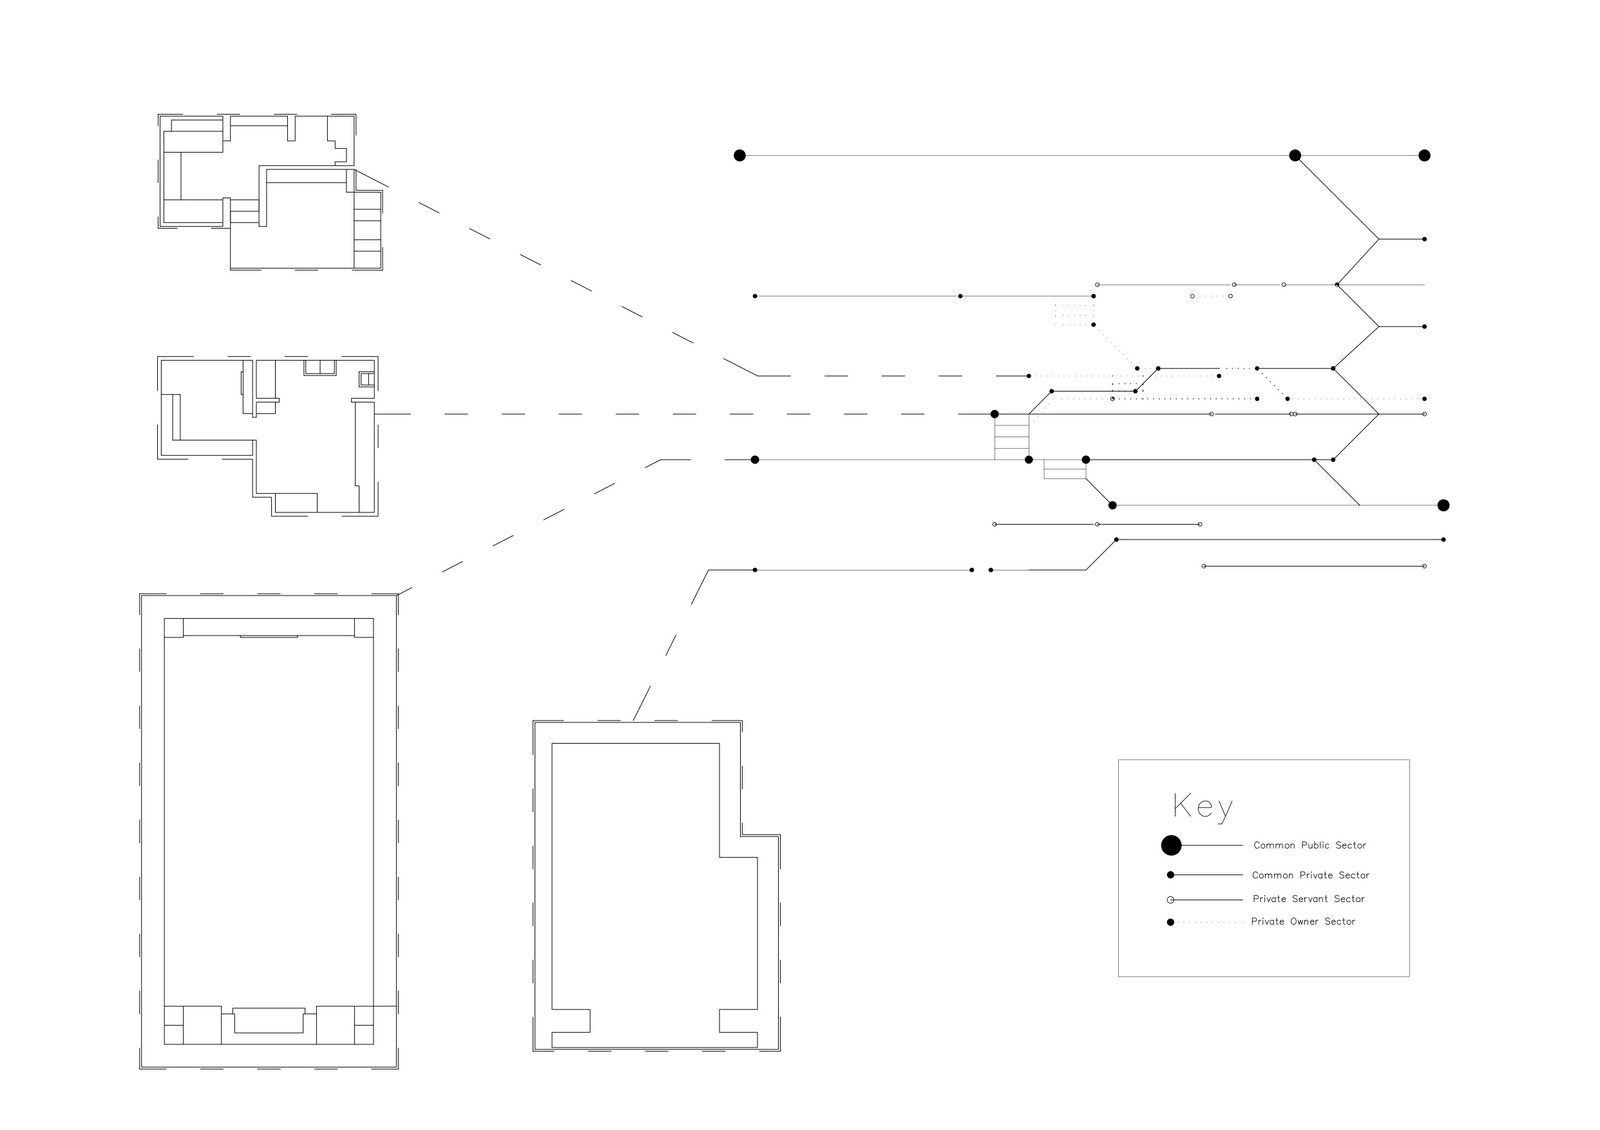 ARCH 1201 : Architectural Design Studio 3: Project two